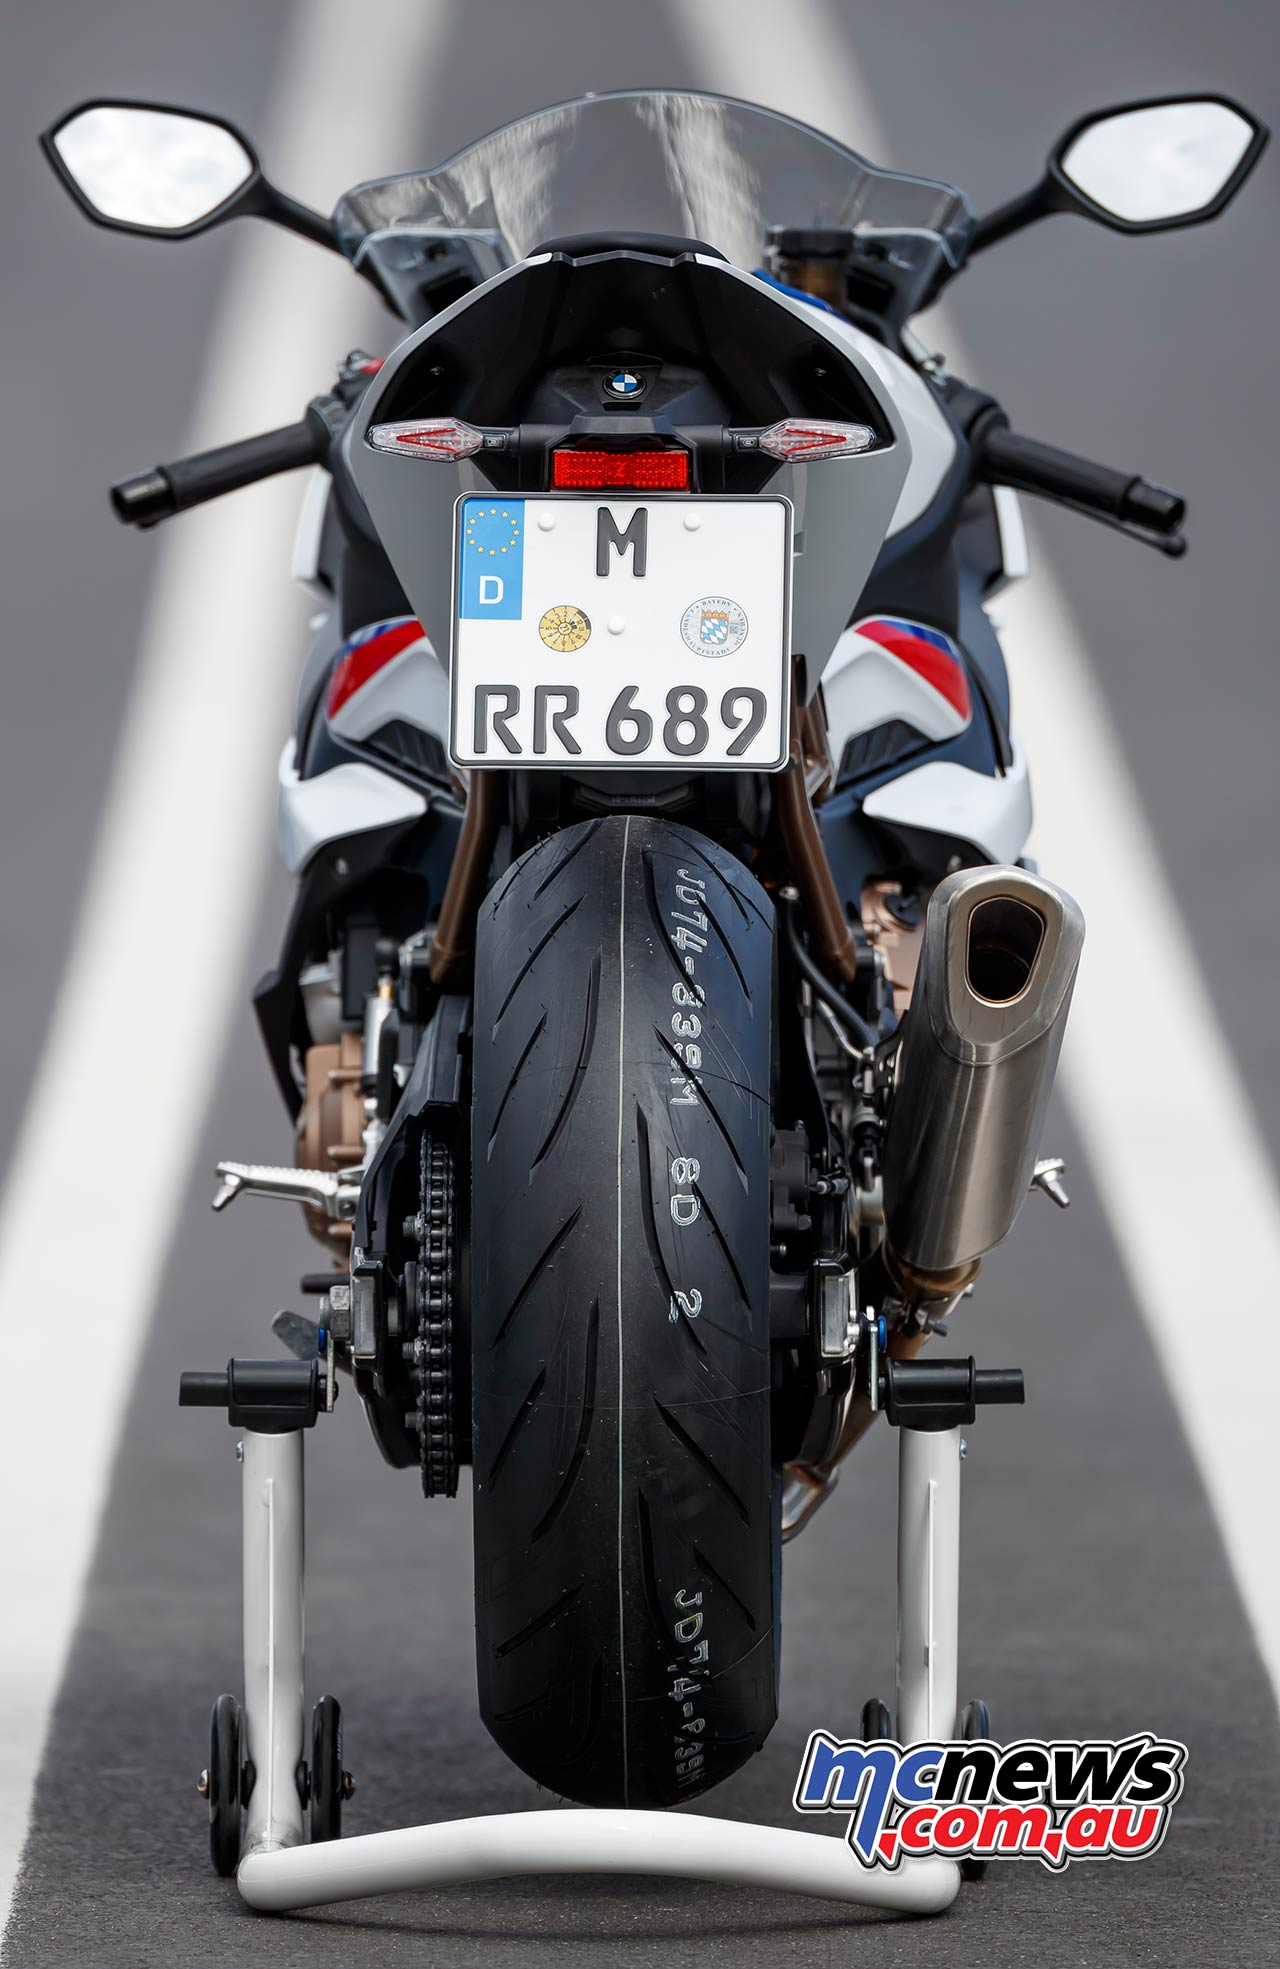 2019 Bmw S 1000 Rr M Review Motorcycle Test Mcnews Com Au